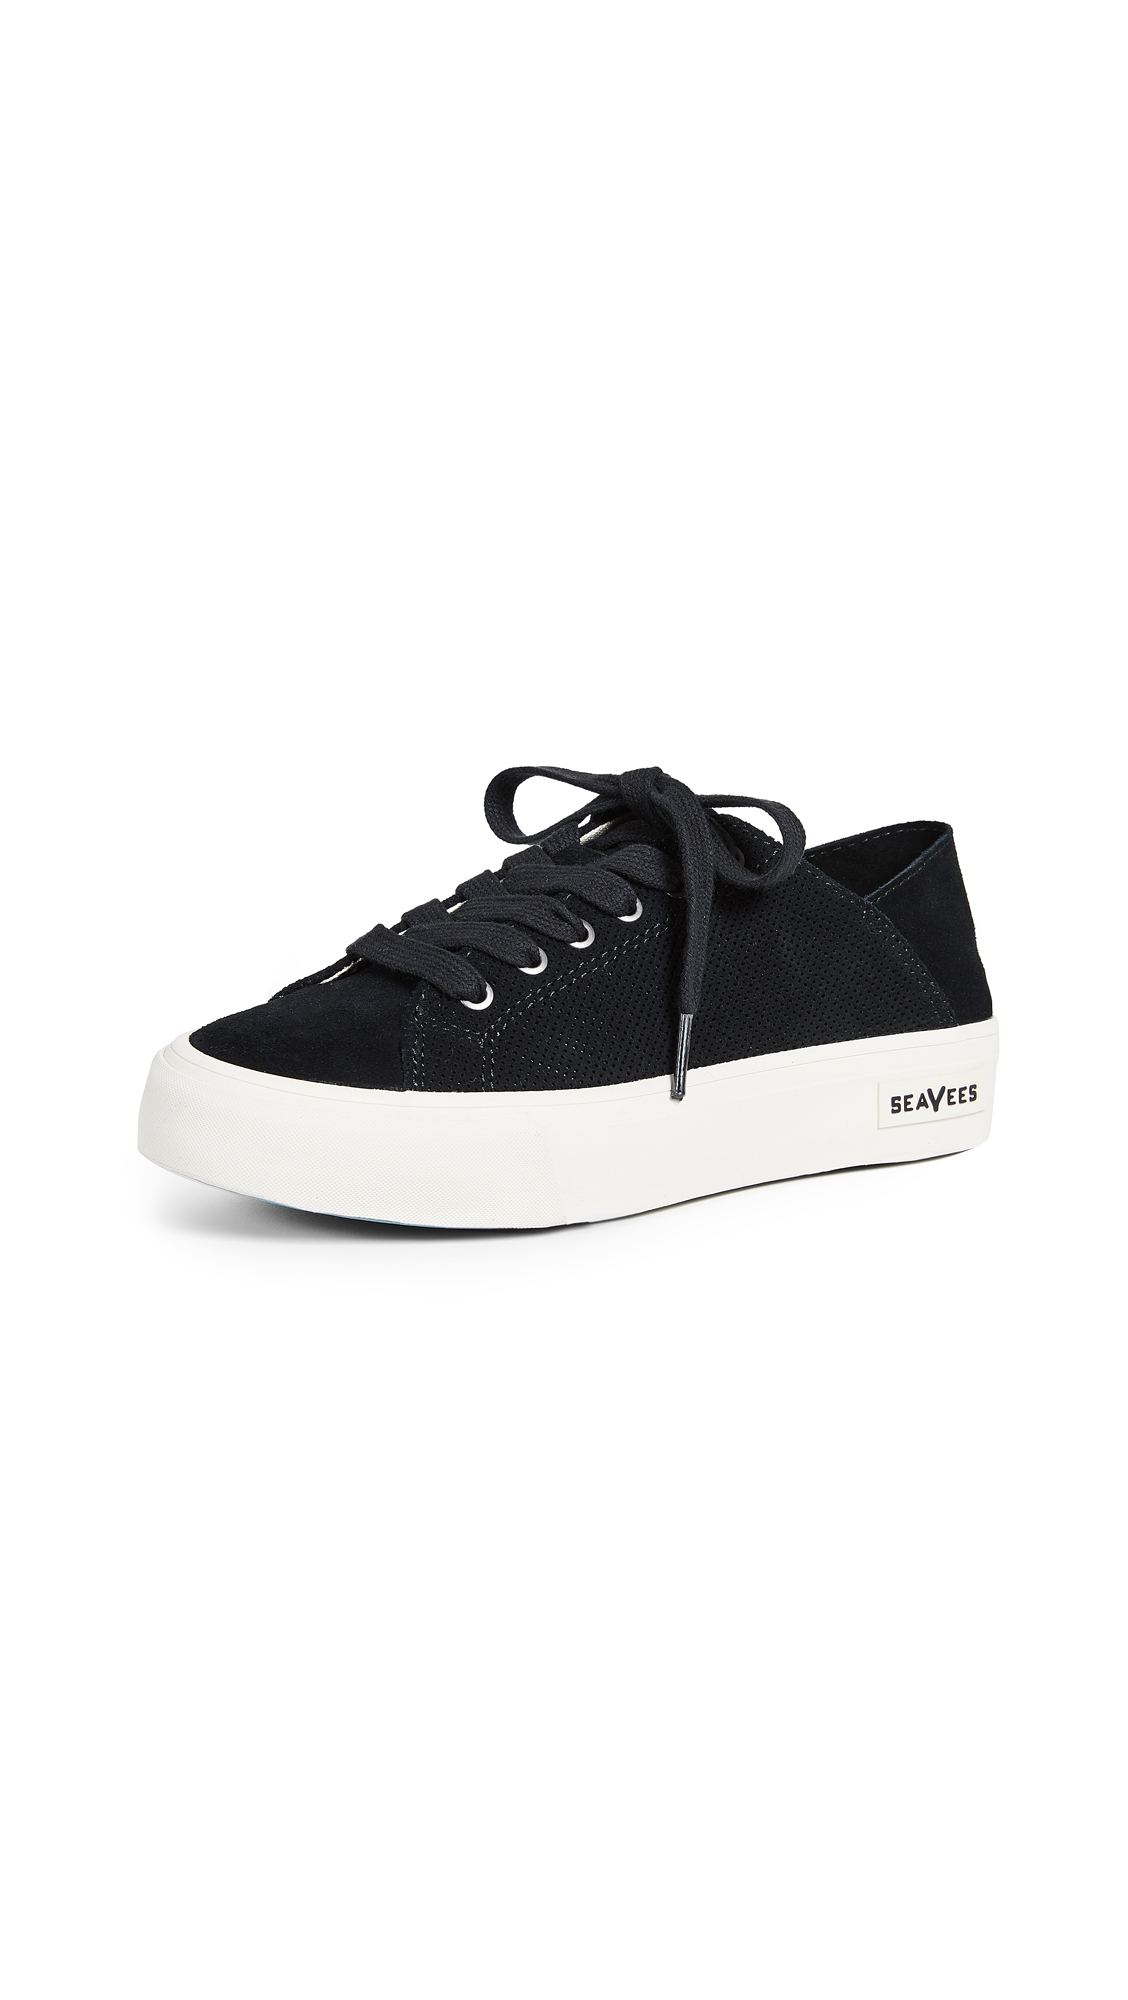 SeaVees Sausalito Convertible Sneakers